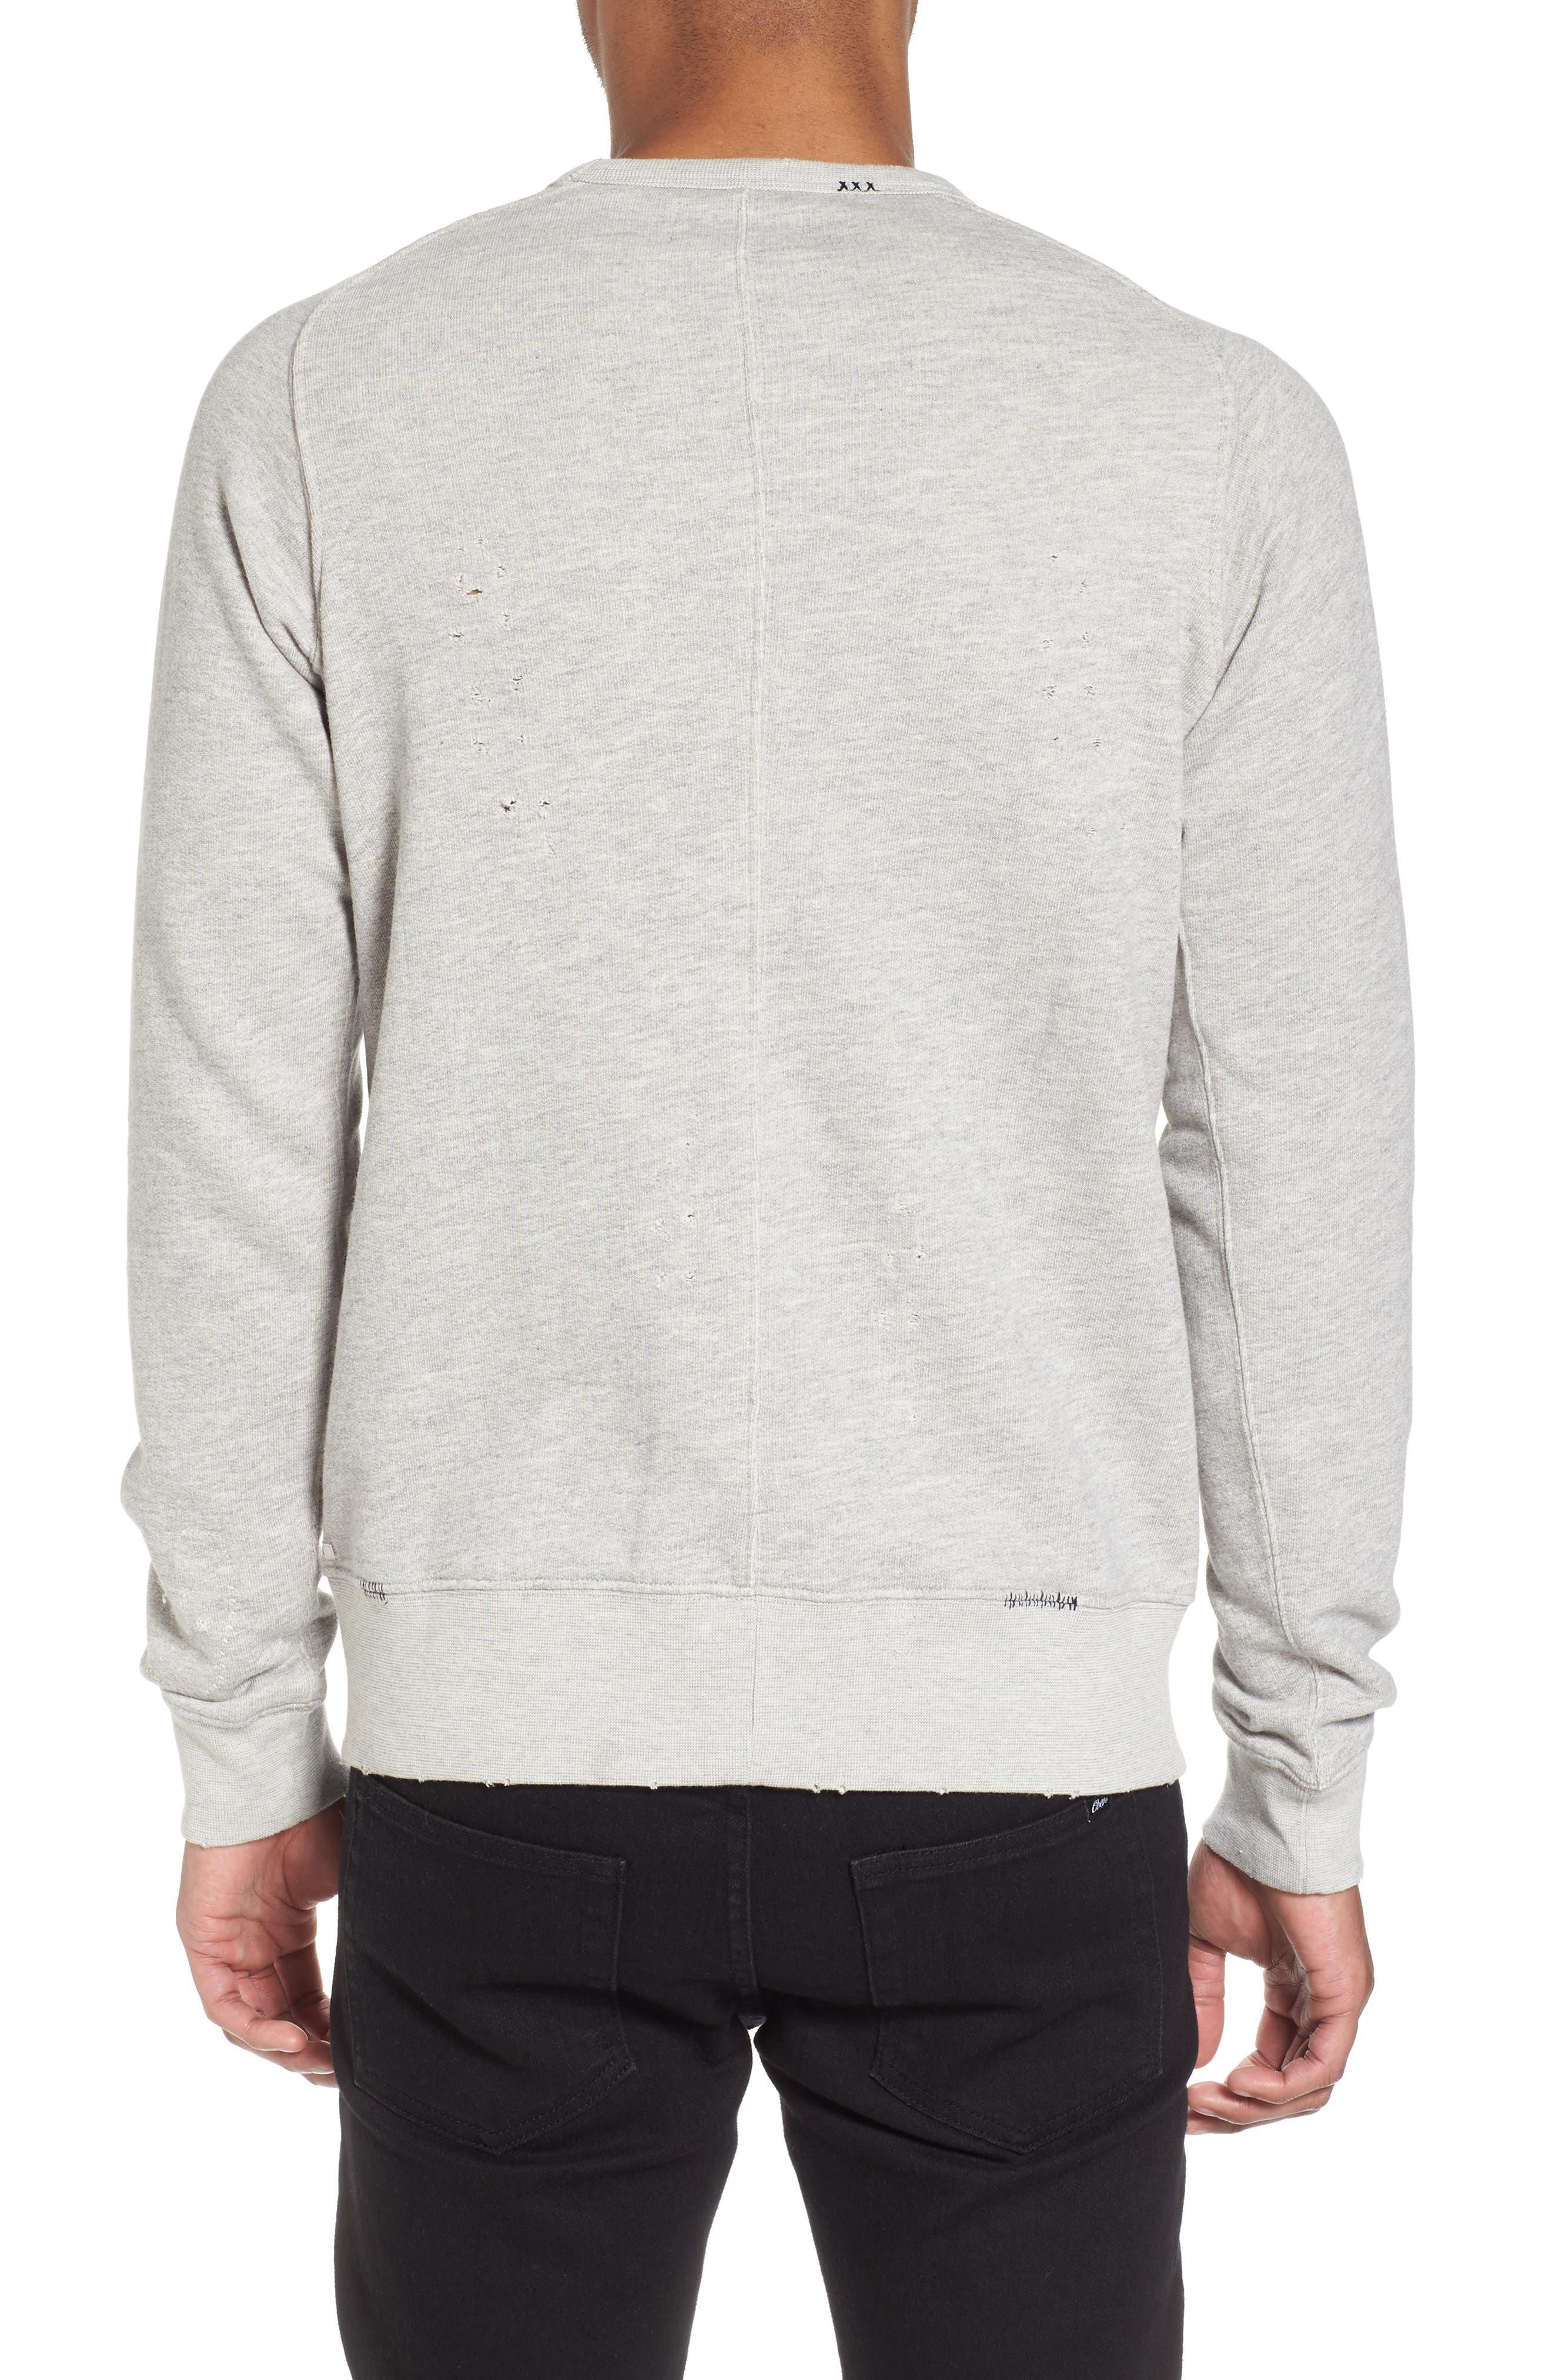 Lot 22 Sweatshirt,                             Alternate thumbnail 2, color,                             450